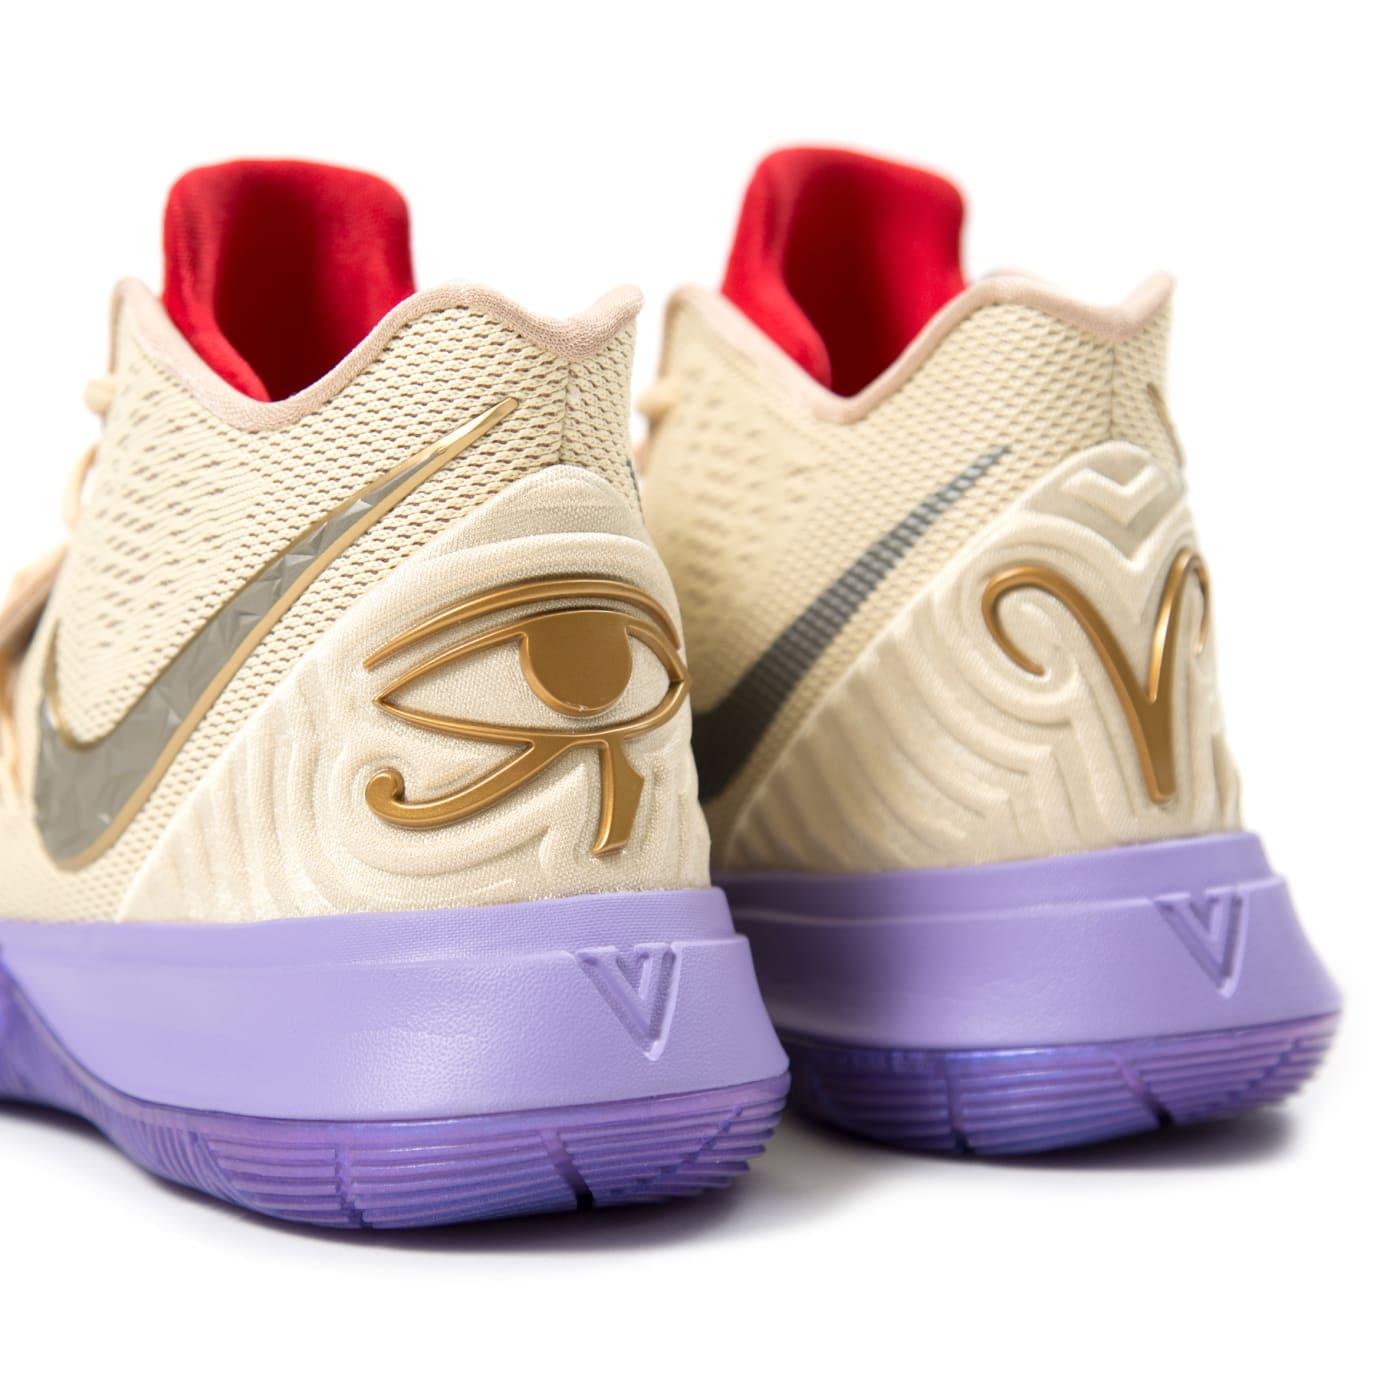 Concepts x Nike Kyrie 5 'Ikhet' (Heel)